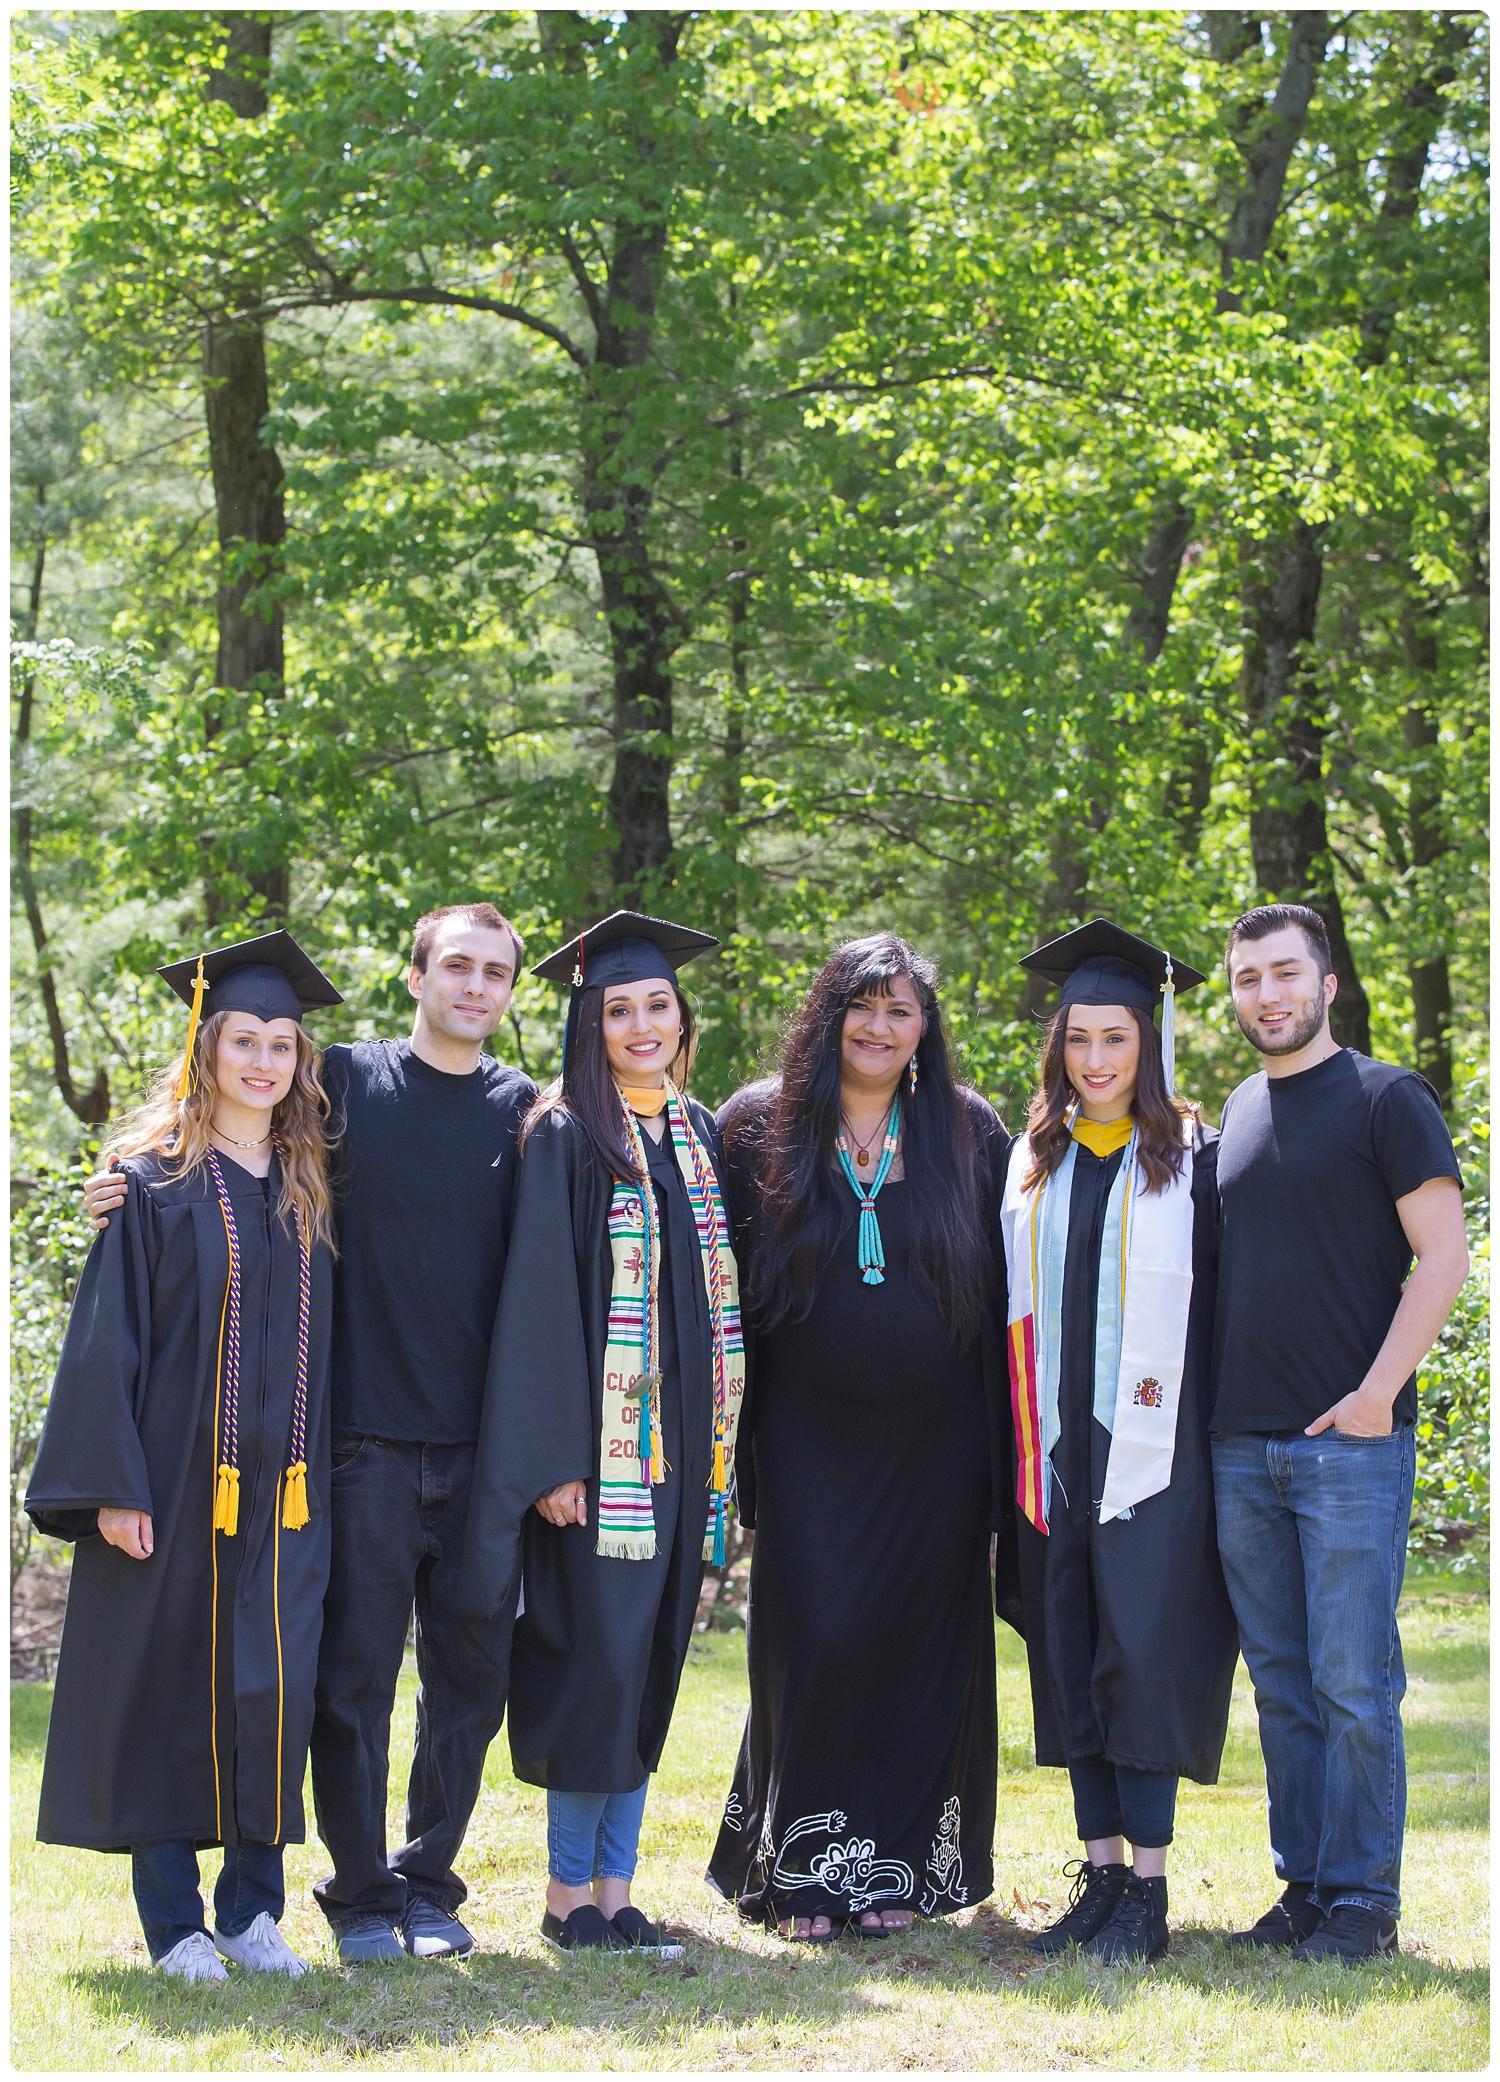 cape-cod-graduation-family-photo.jpg